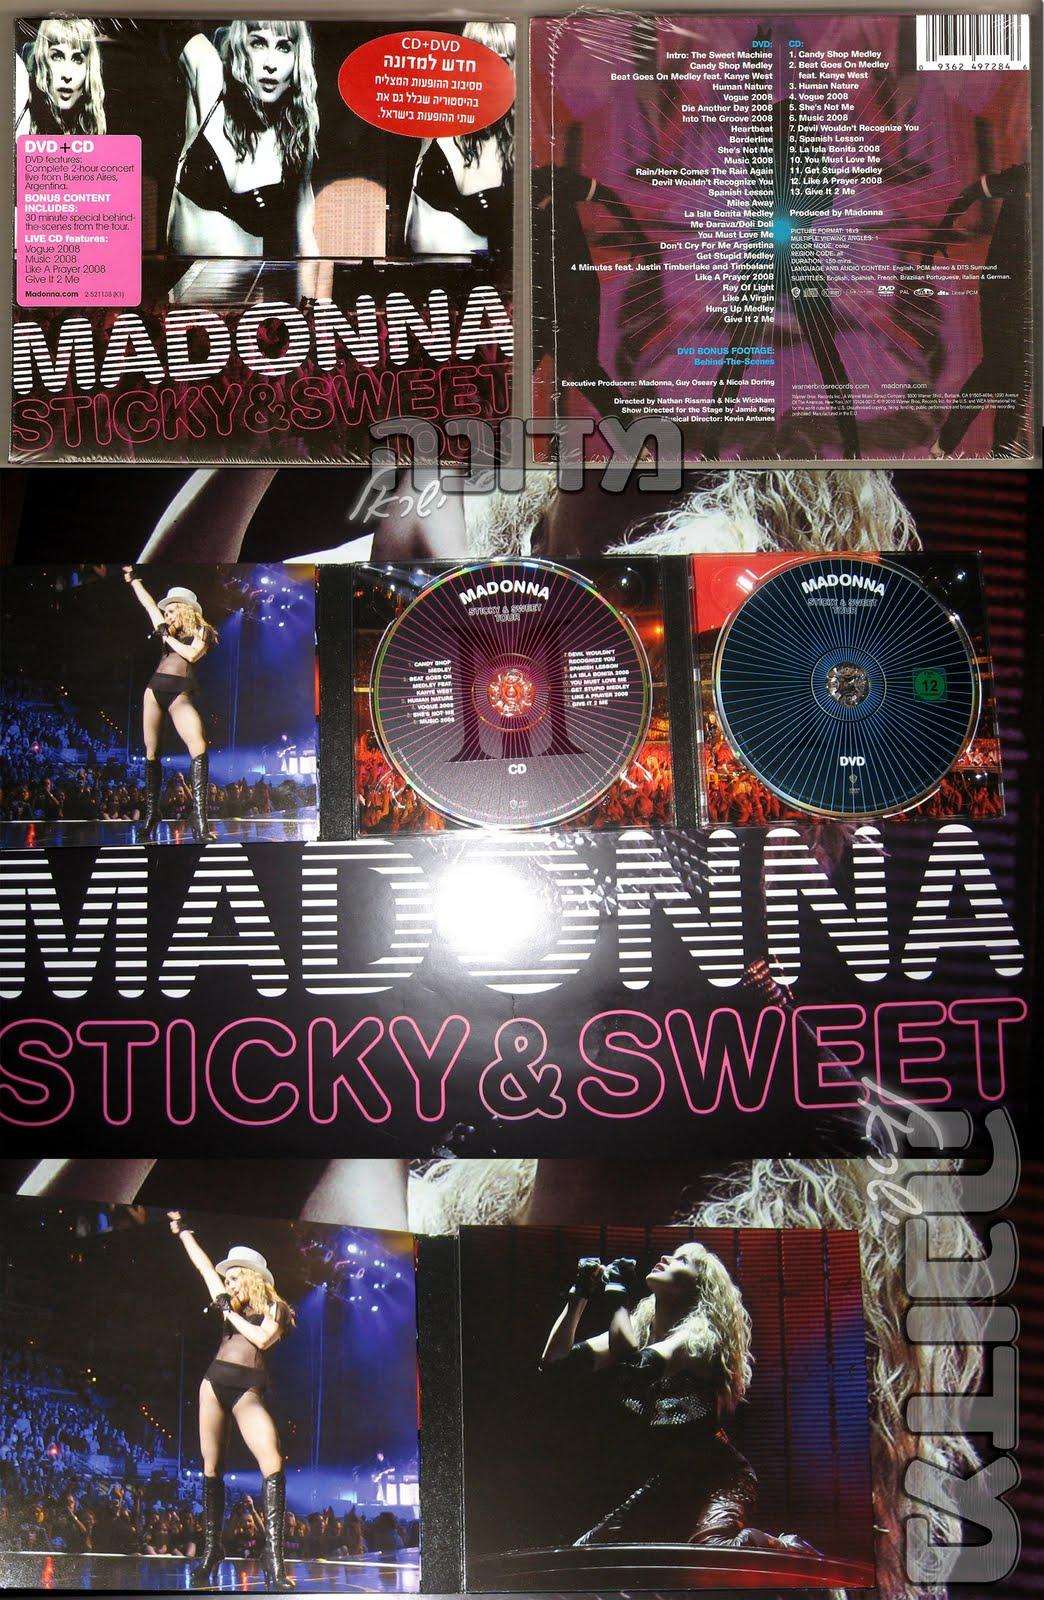 http://1.bp.blogspot.com/_QZk9-5nrPSU/S6oqqA4MkQI/AAAAAAAADDs/POW2XF2FXmw/s1600/Sticky+and+Sweet+Digipack+Israel+%281%29.jpg